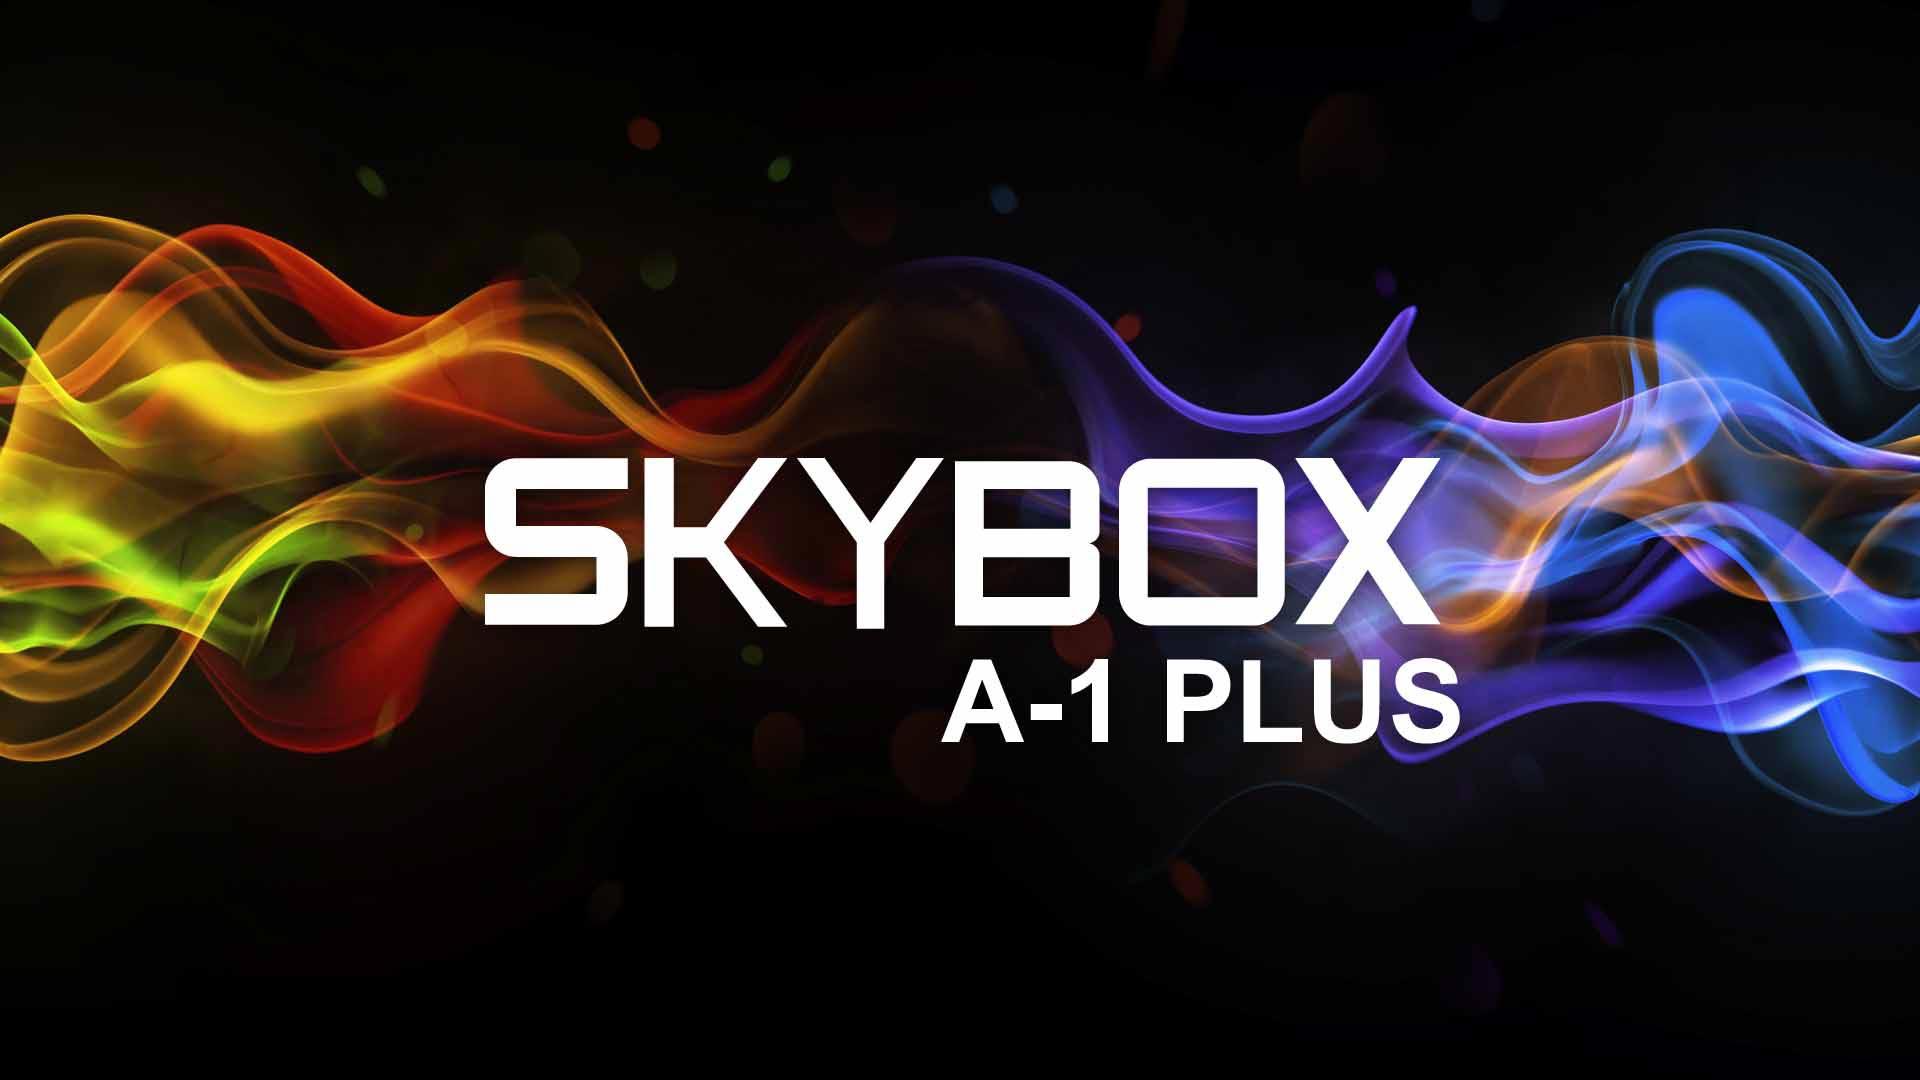 Cara Mengganti Boot Logo Skybox A1 Plus memakai Foto Sendiri